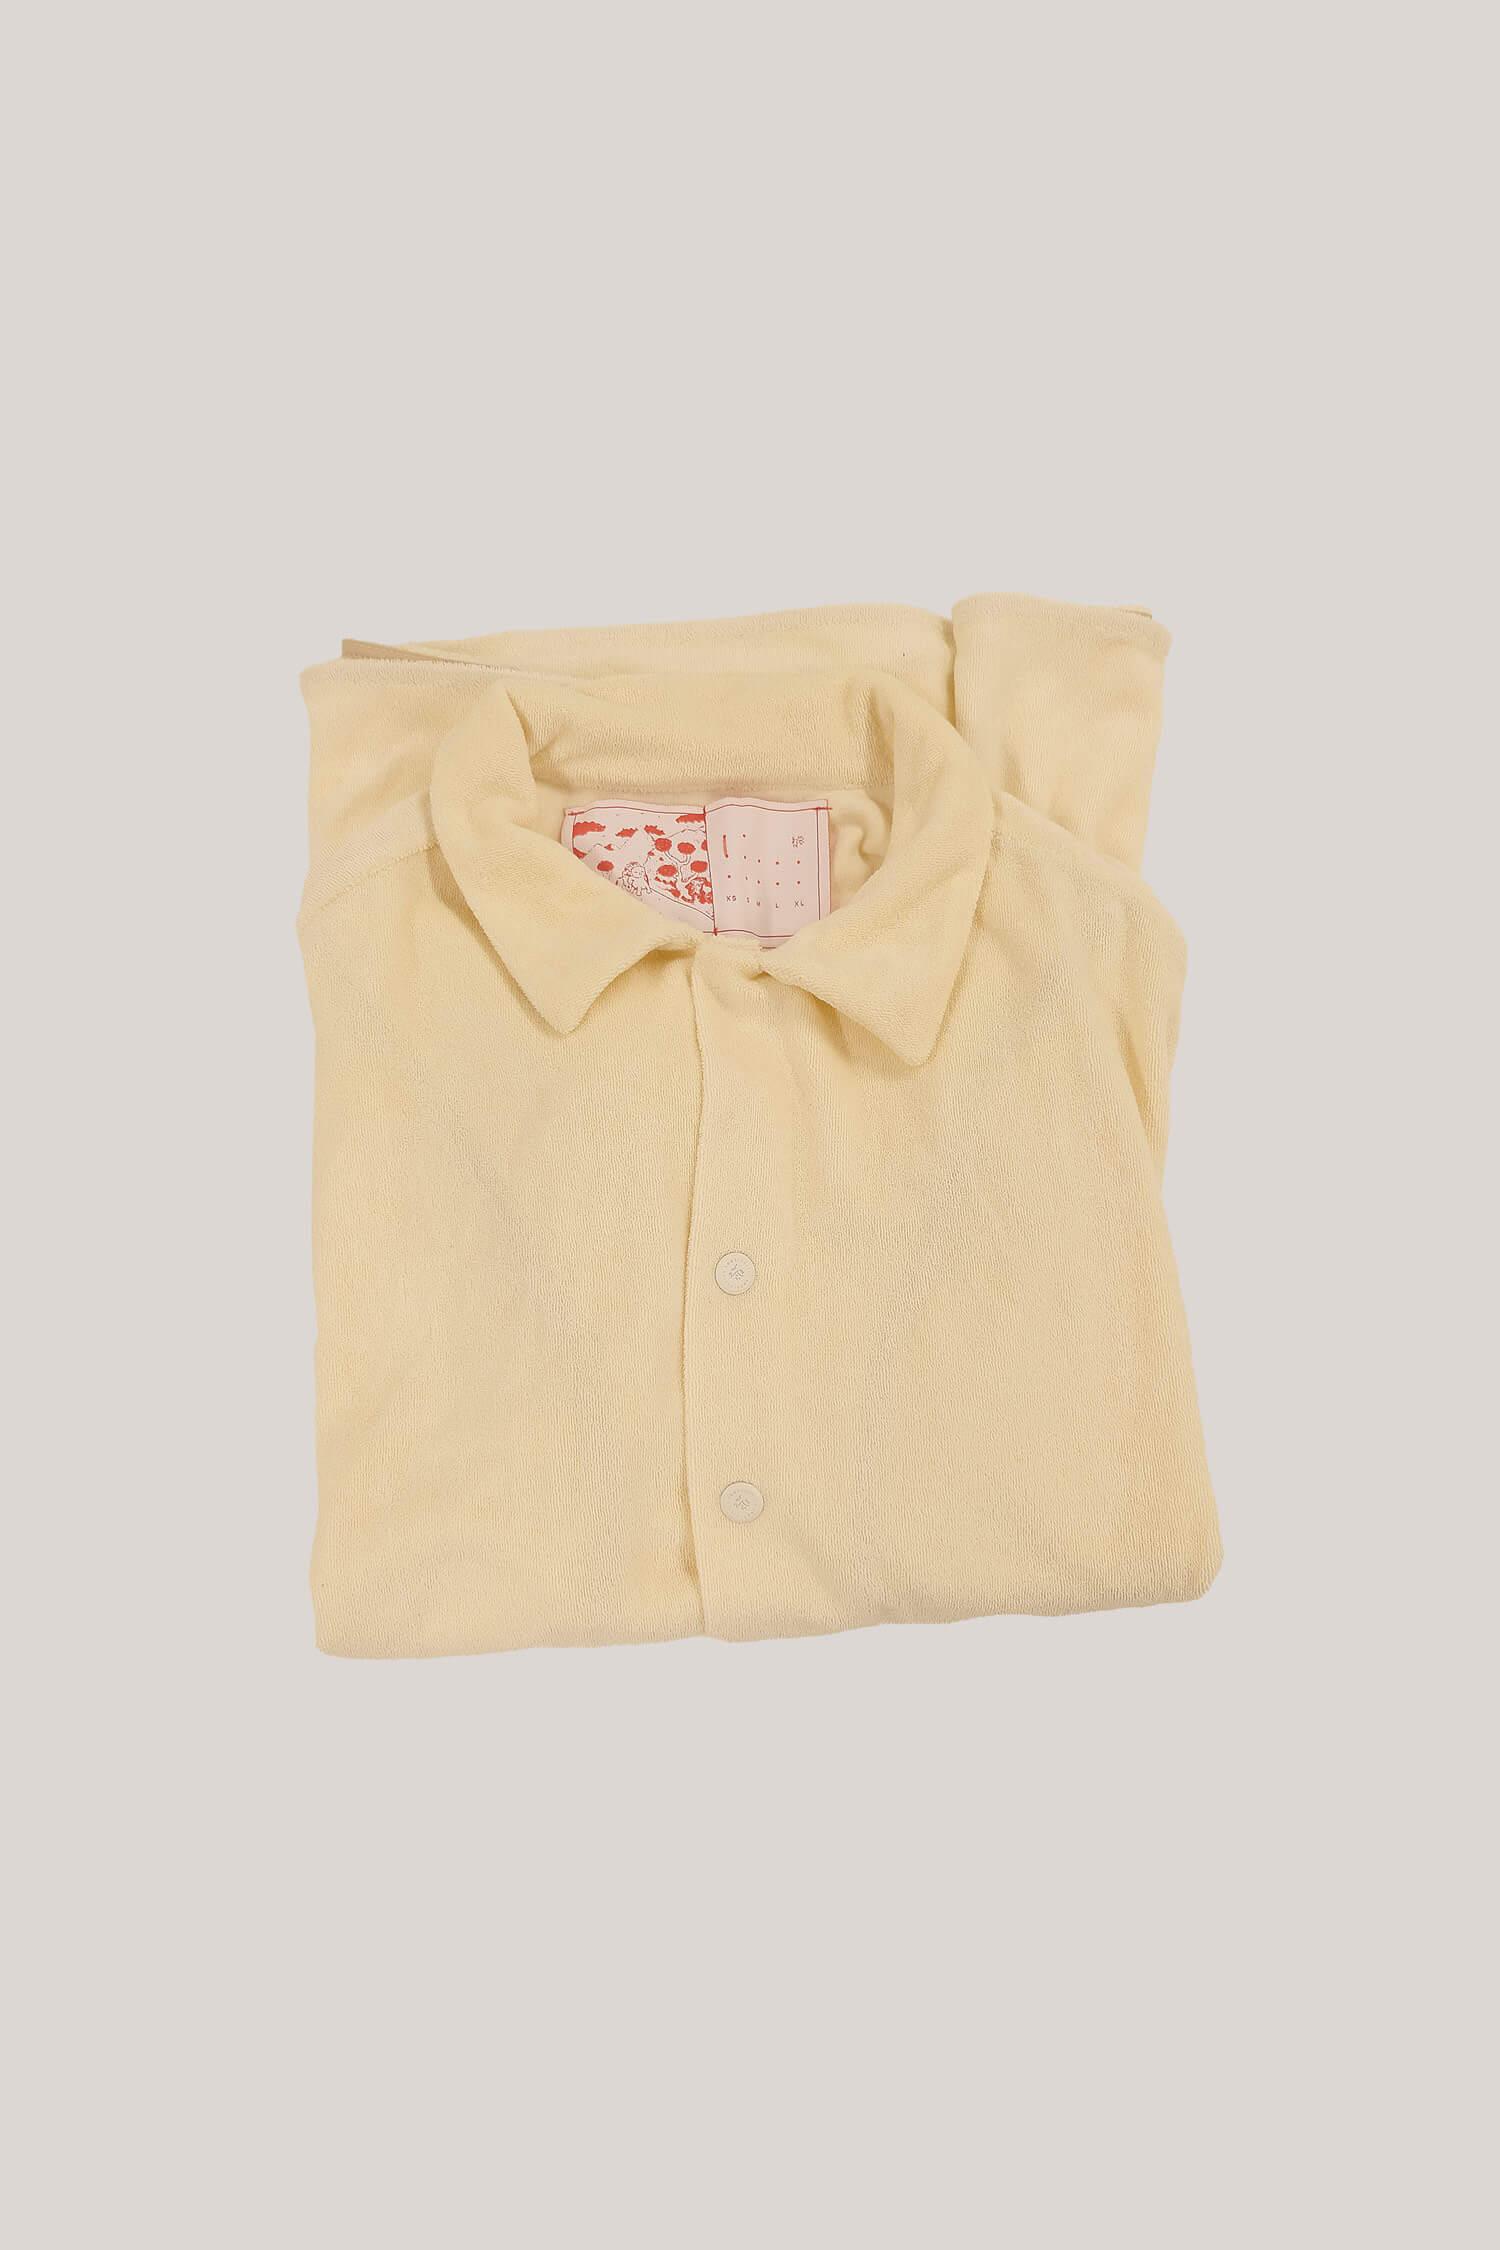 31-Terry-Shirt-3